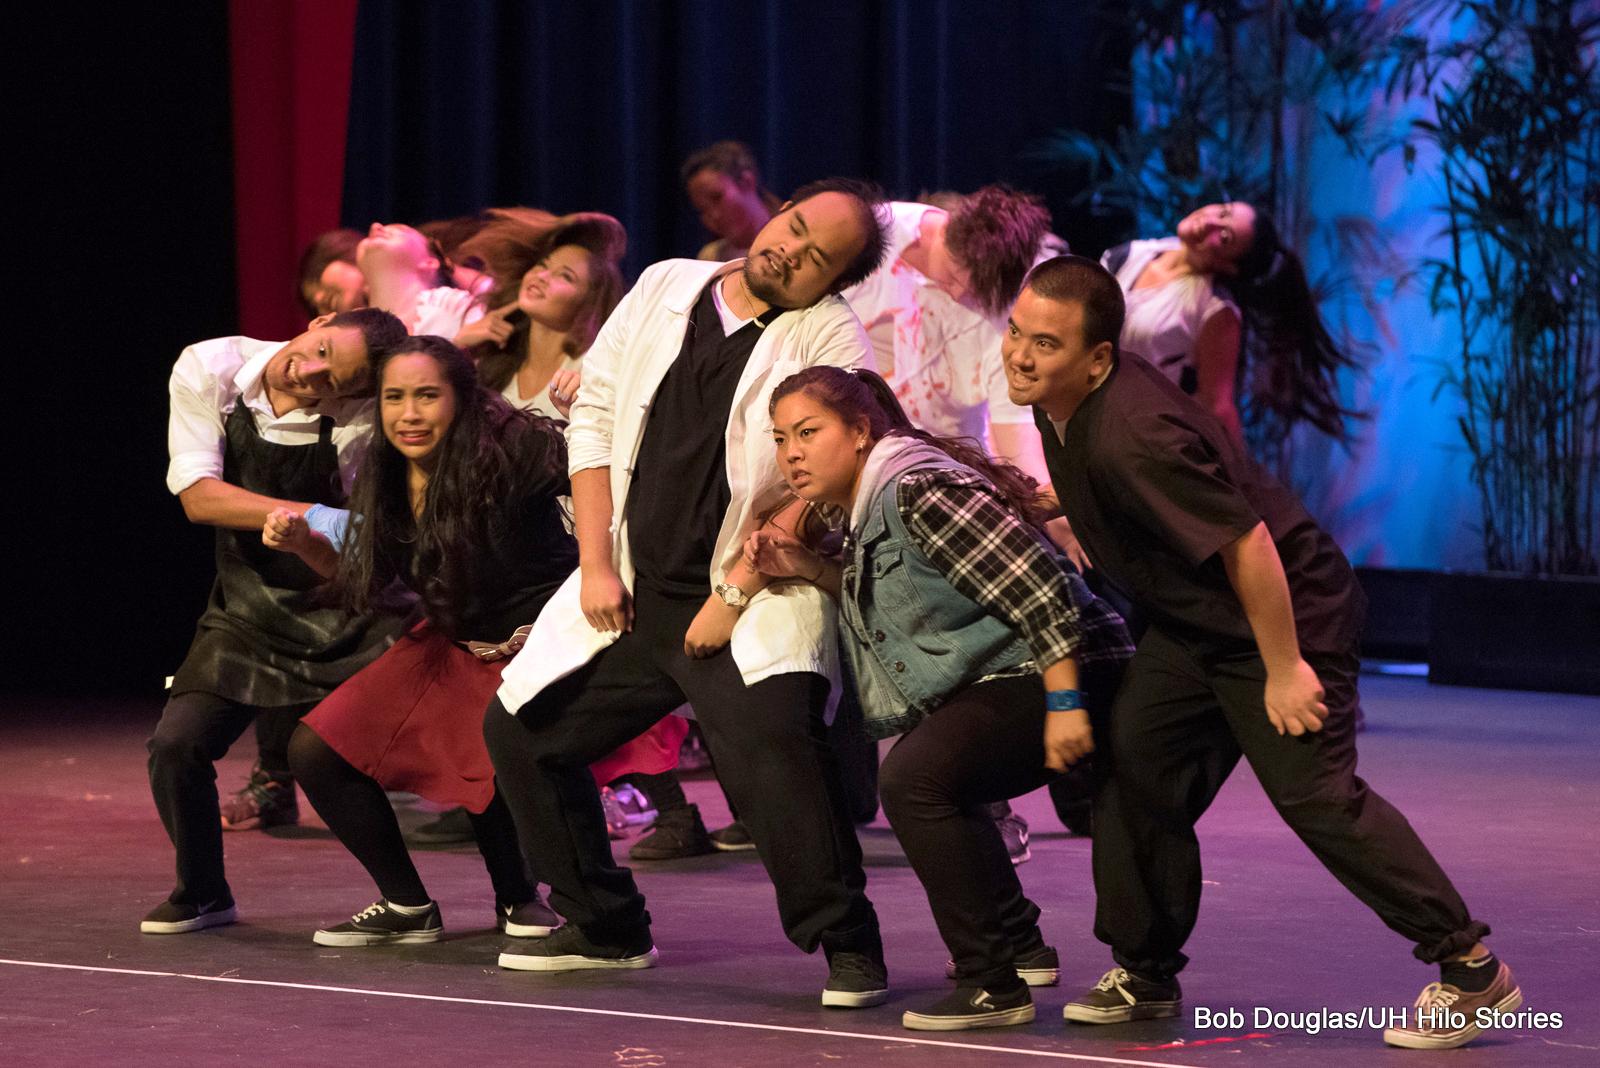 Dancers in modern garb.